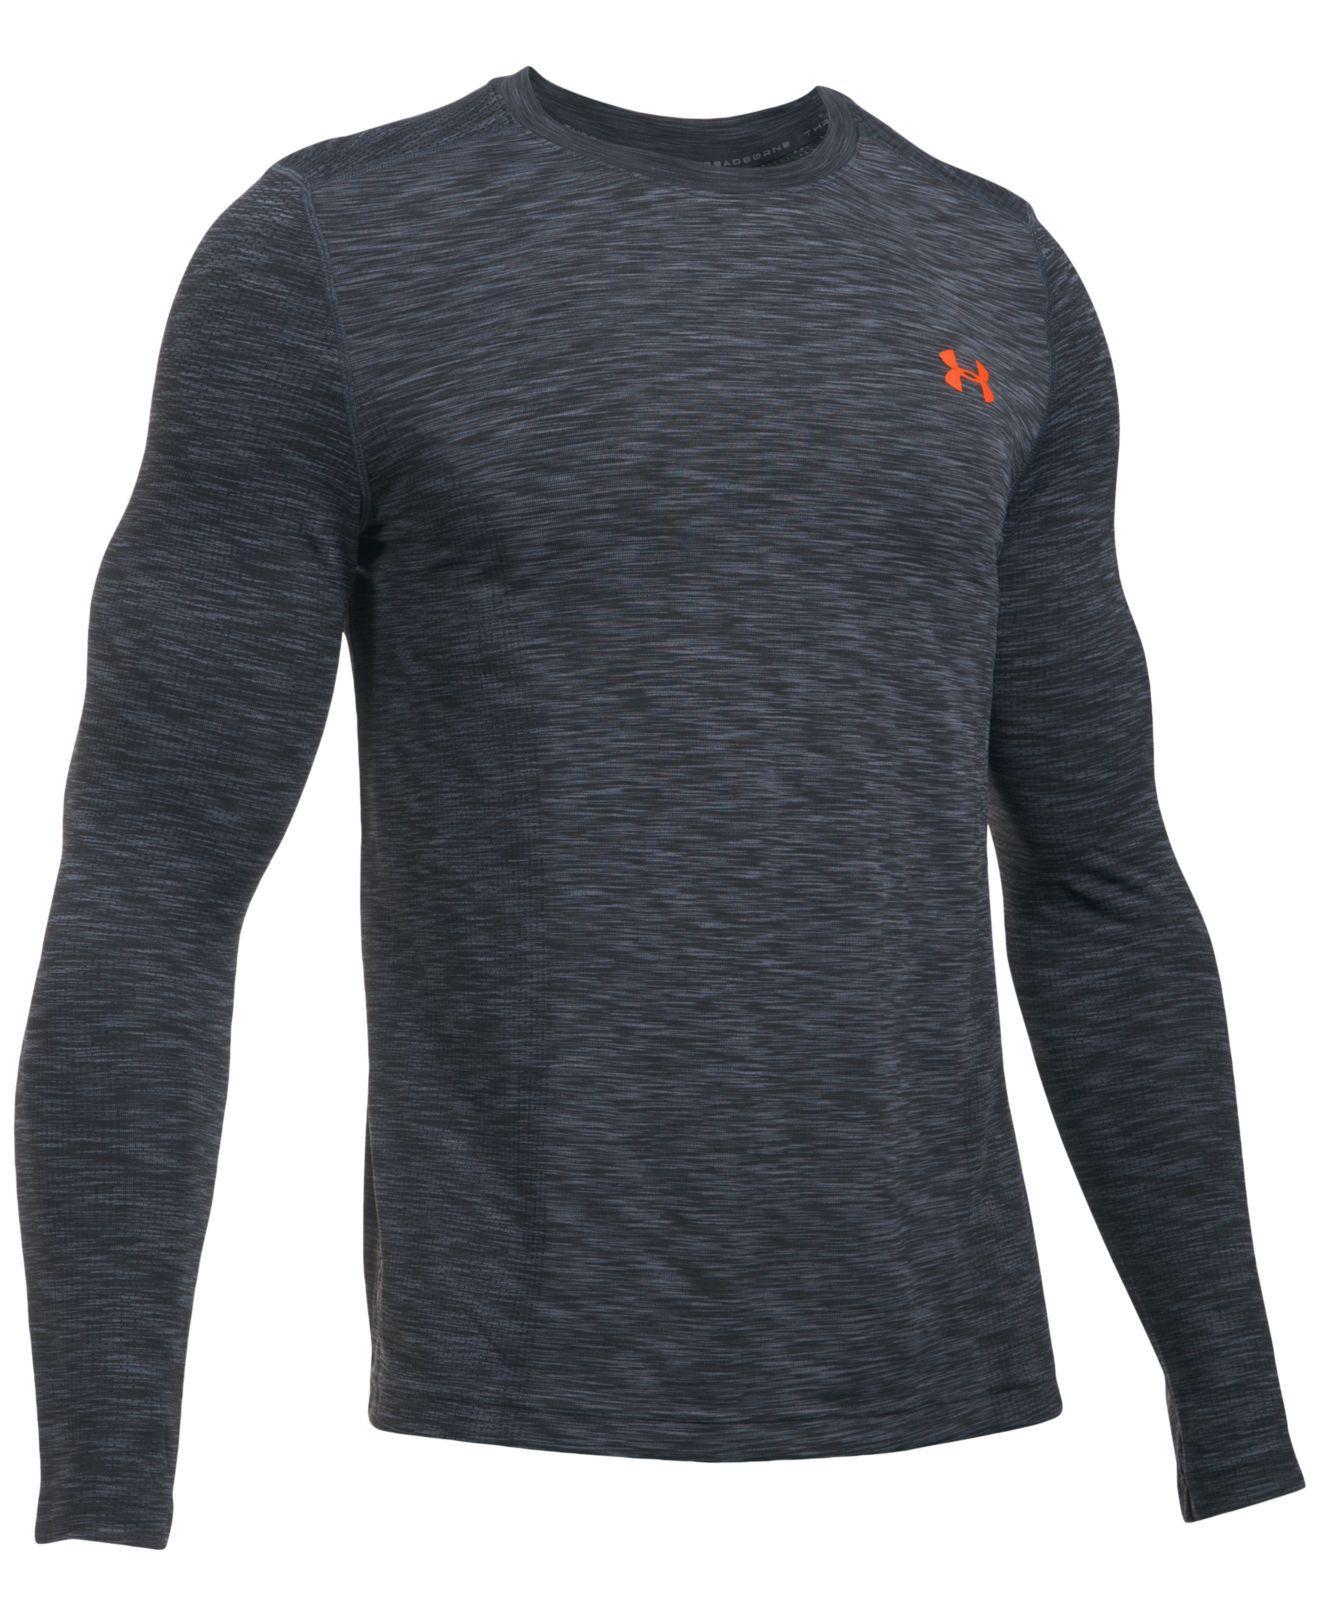 Lyst under armour men 39 s threadborne seamless shirt in for Gray under armour shirt